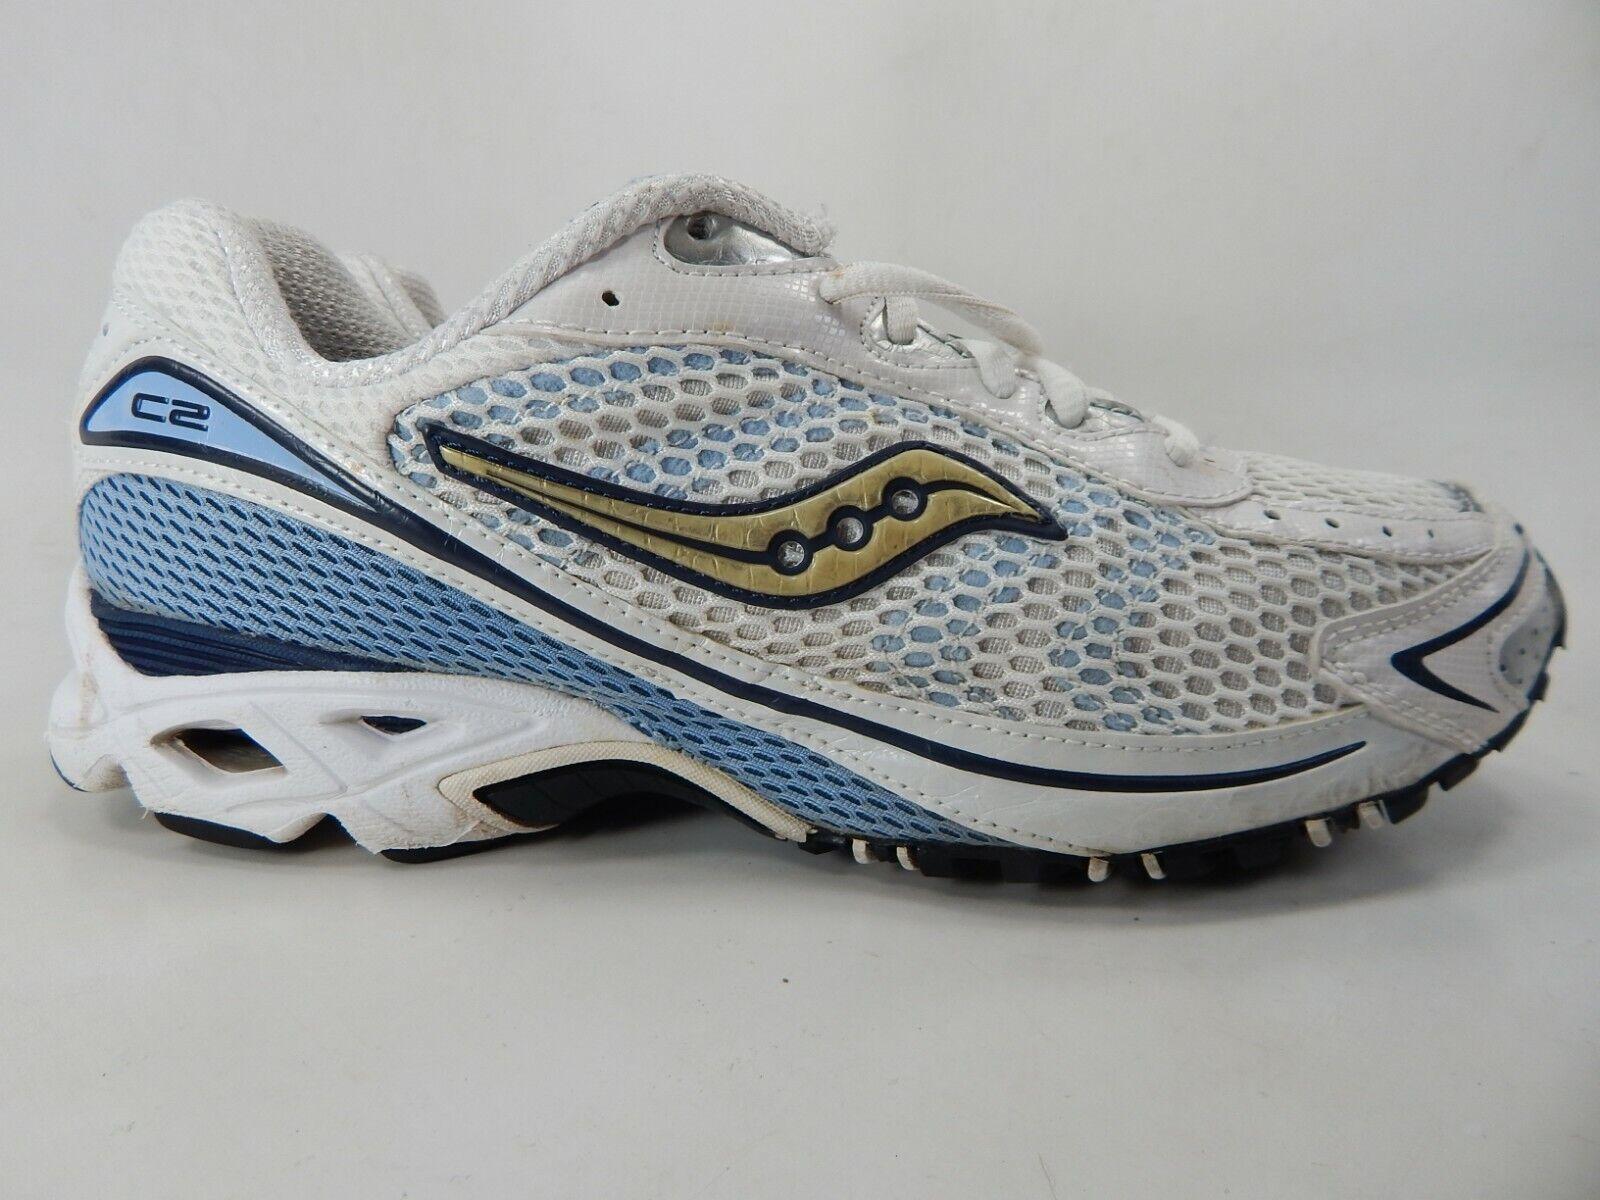 Saucony Grid C2 Flash Size 10 M (B) EU 42 Women's Running shoes White 15032-2